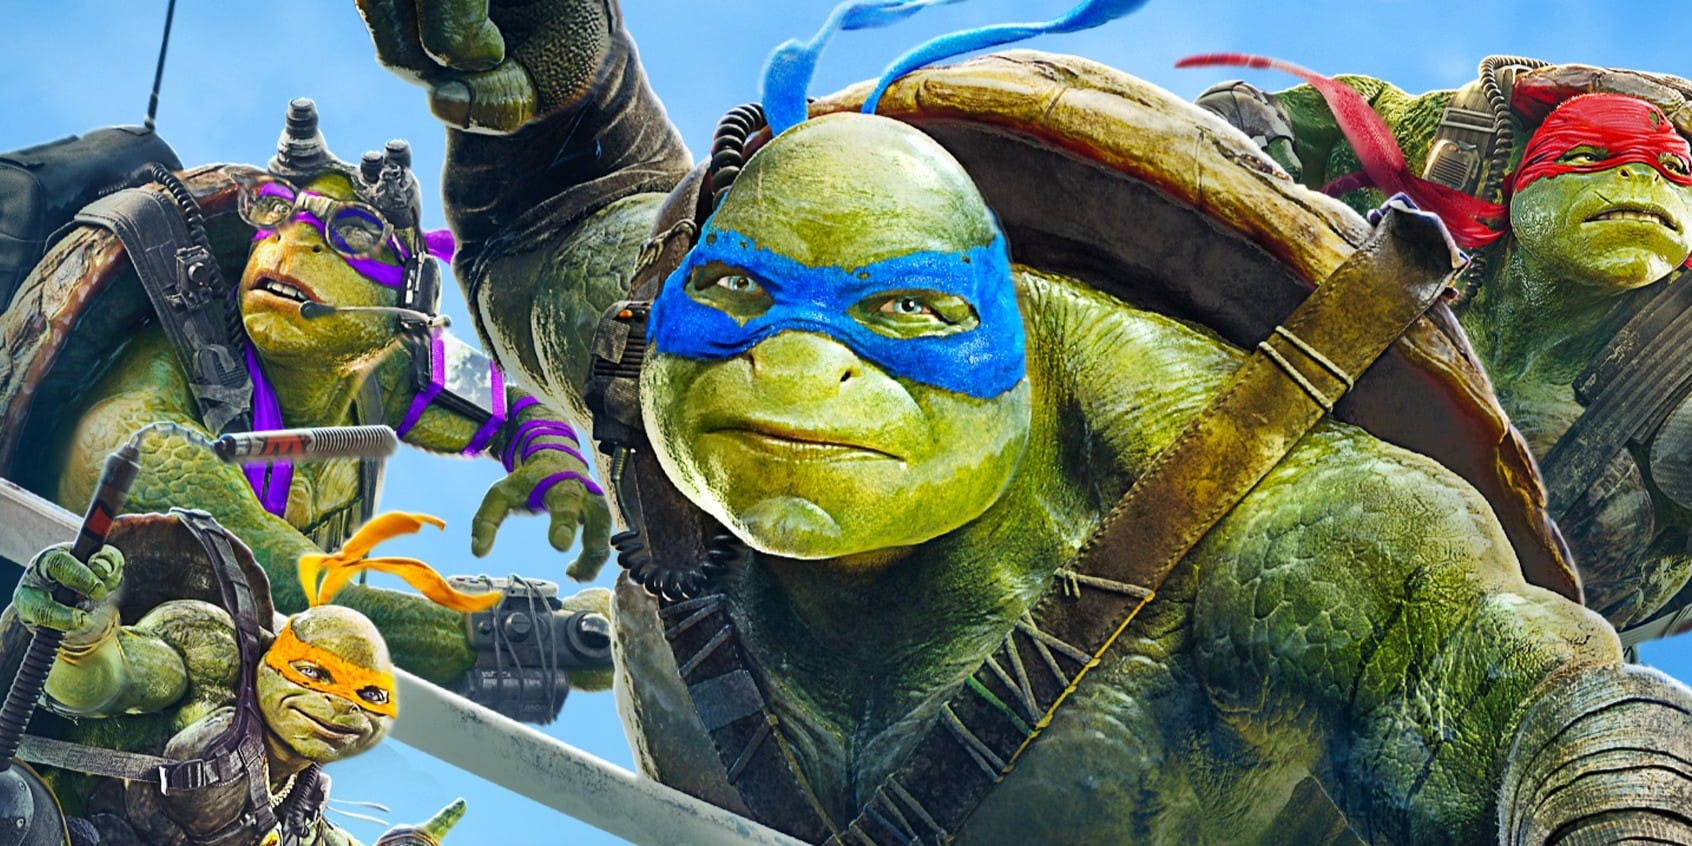 https://celebritycontent.com/2020/02/25/teenage-mutant-ninja-turtles-reboot-will-reportedly-be-dark-and-faithful-to-comics/